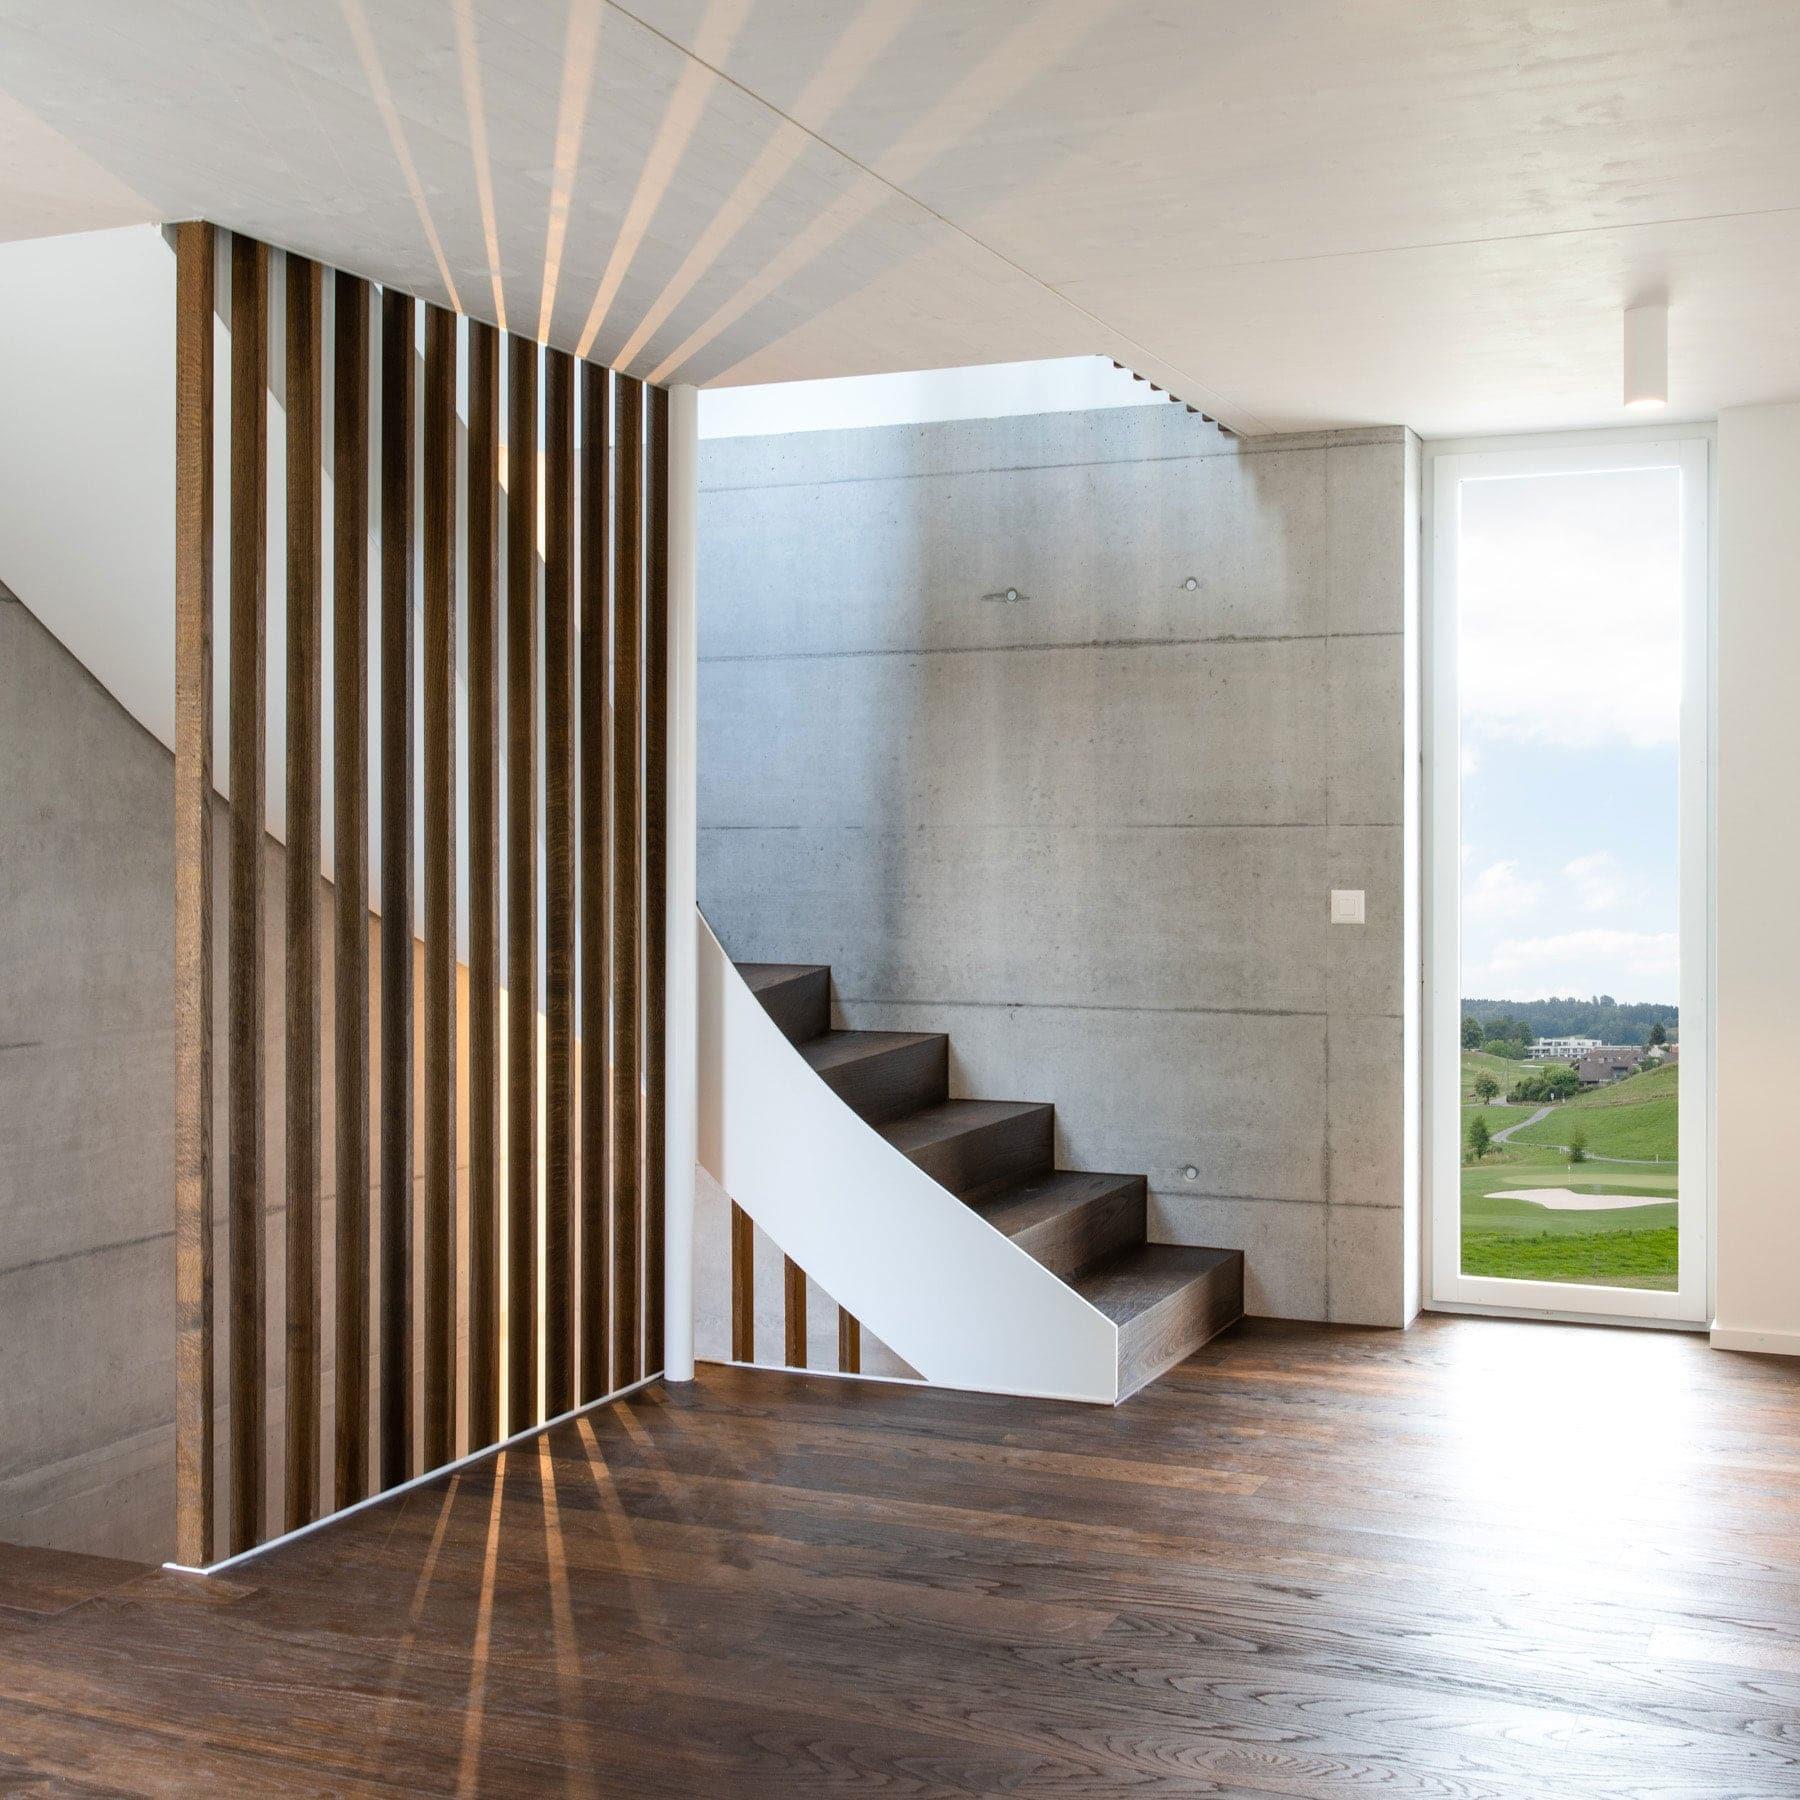 Delussu-Fotografie_Architektur_EFH_Meggen